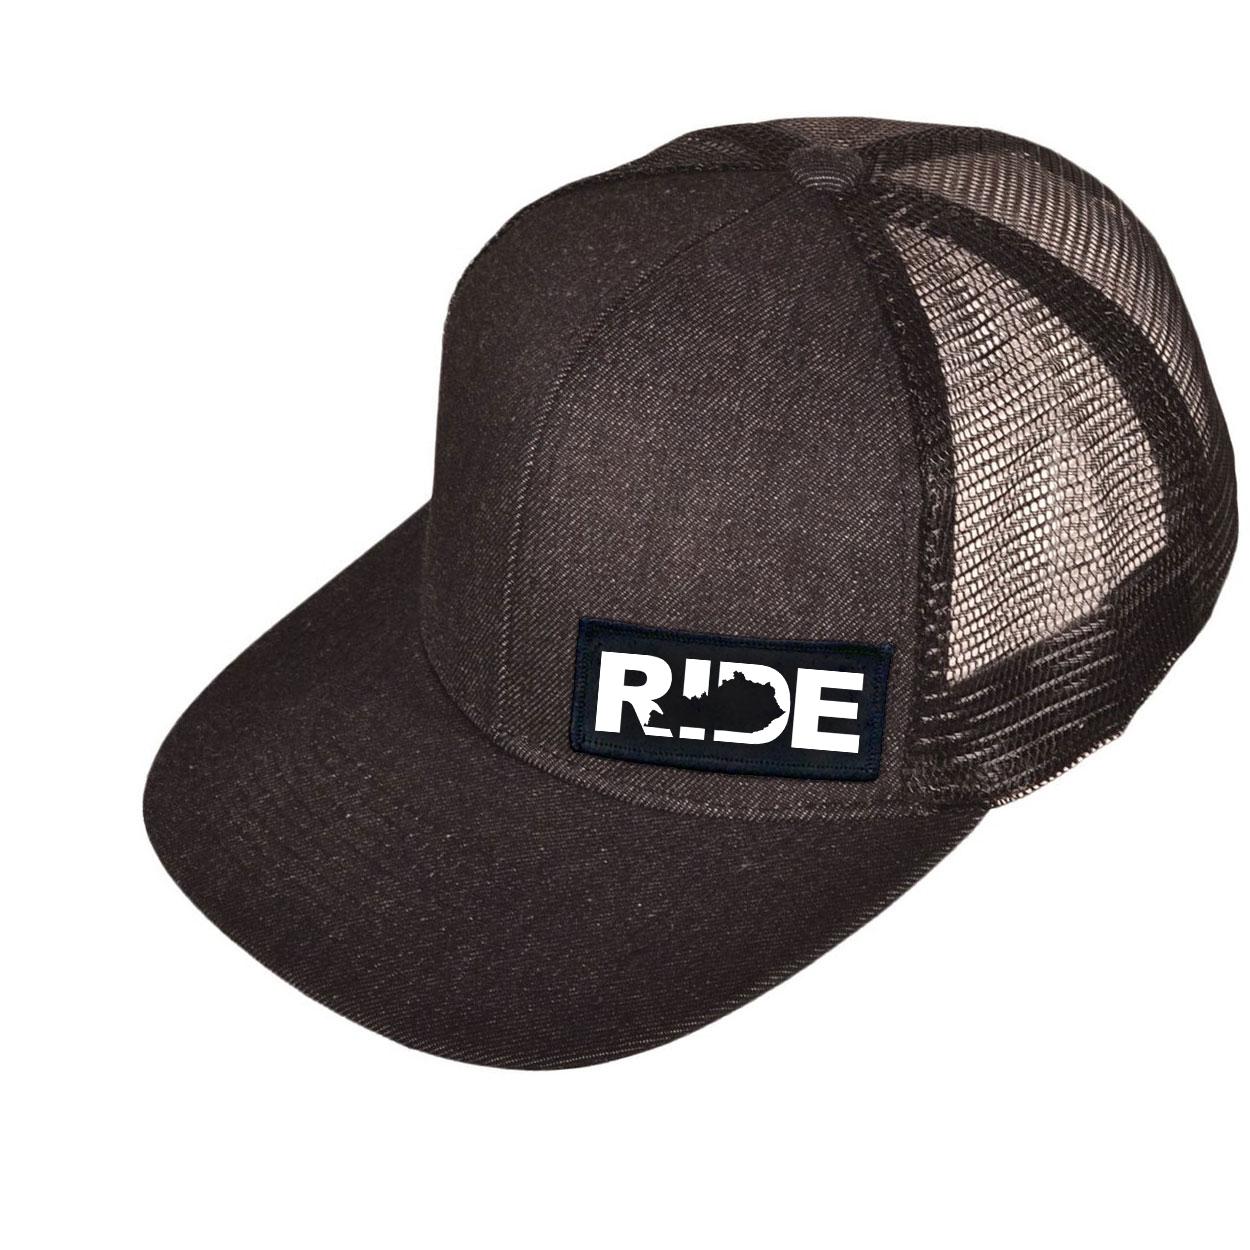 Ride Kentucky Night Out Woven Patch Snapback Flat Brim Hat Black Denim (White Logo)